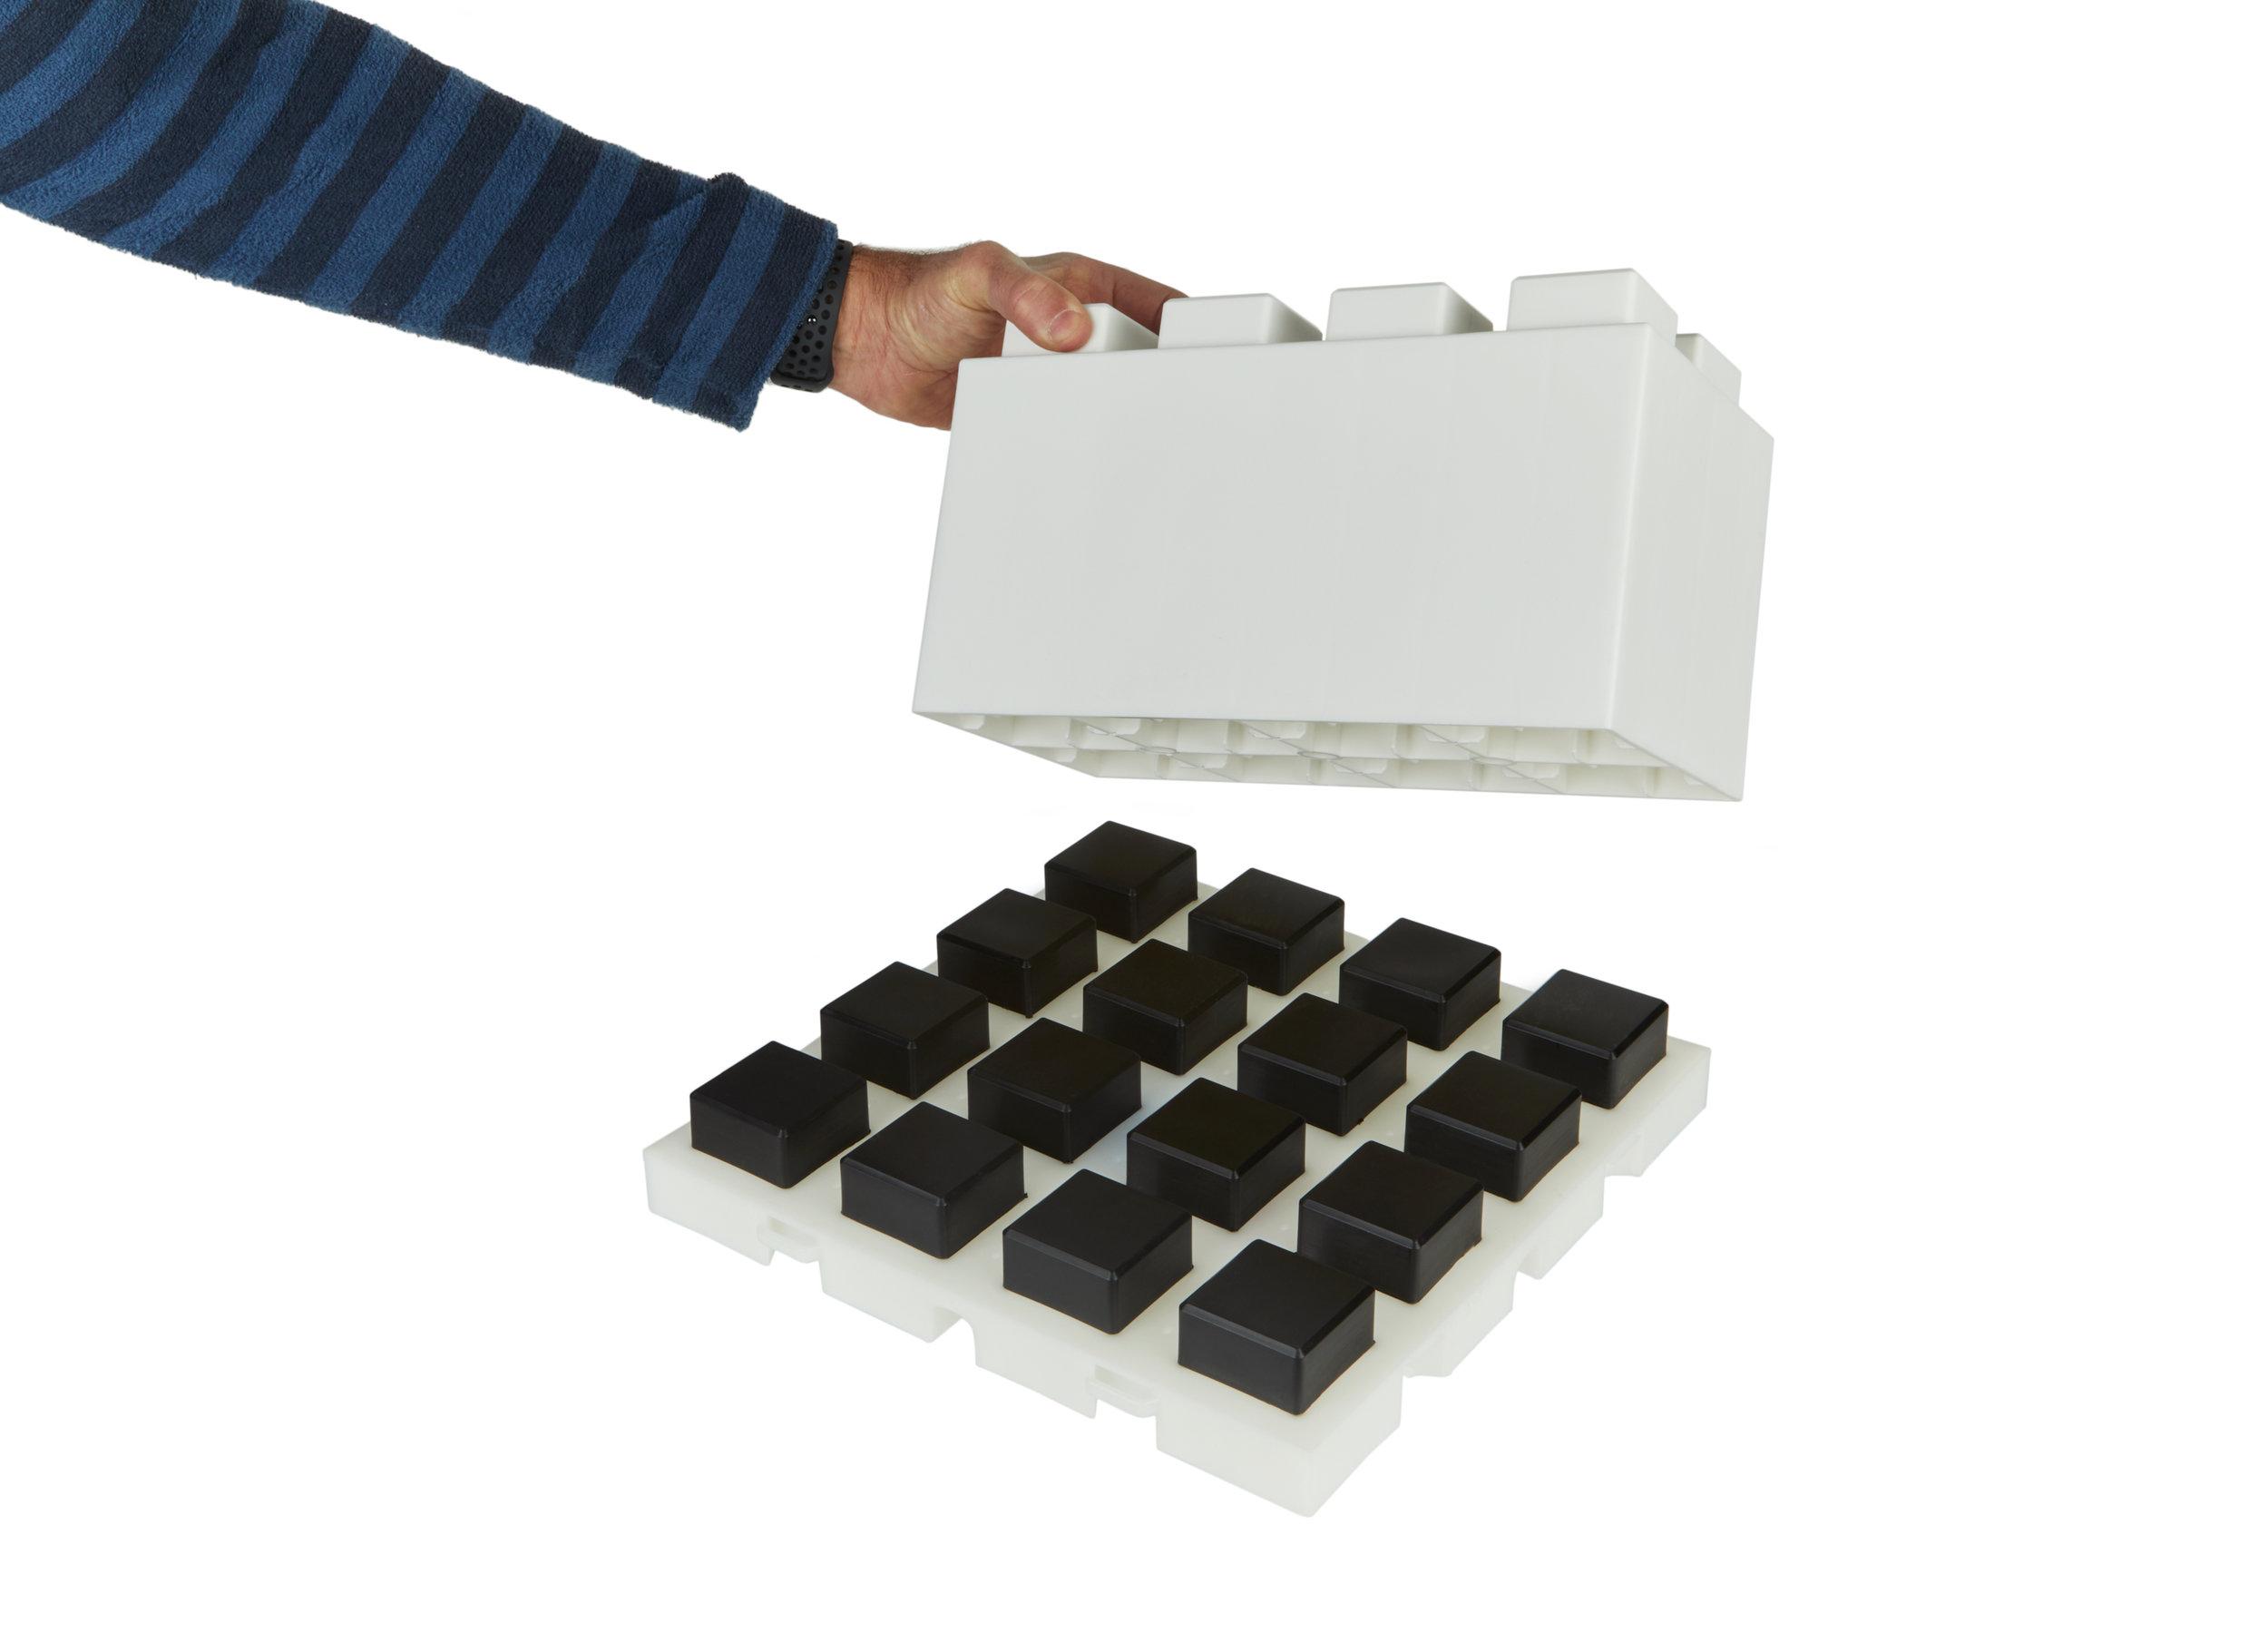 Connecting Block to EverBlock Flooring